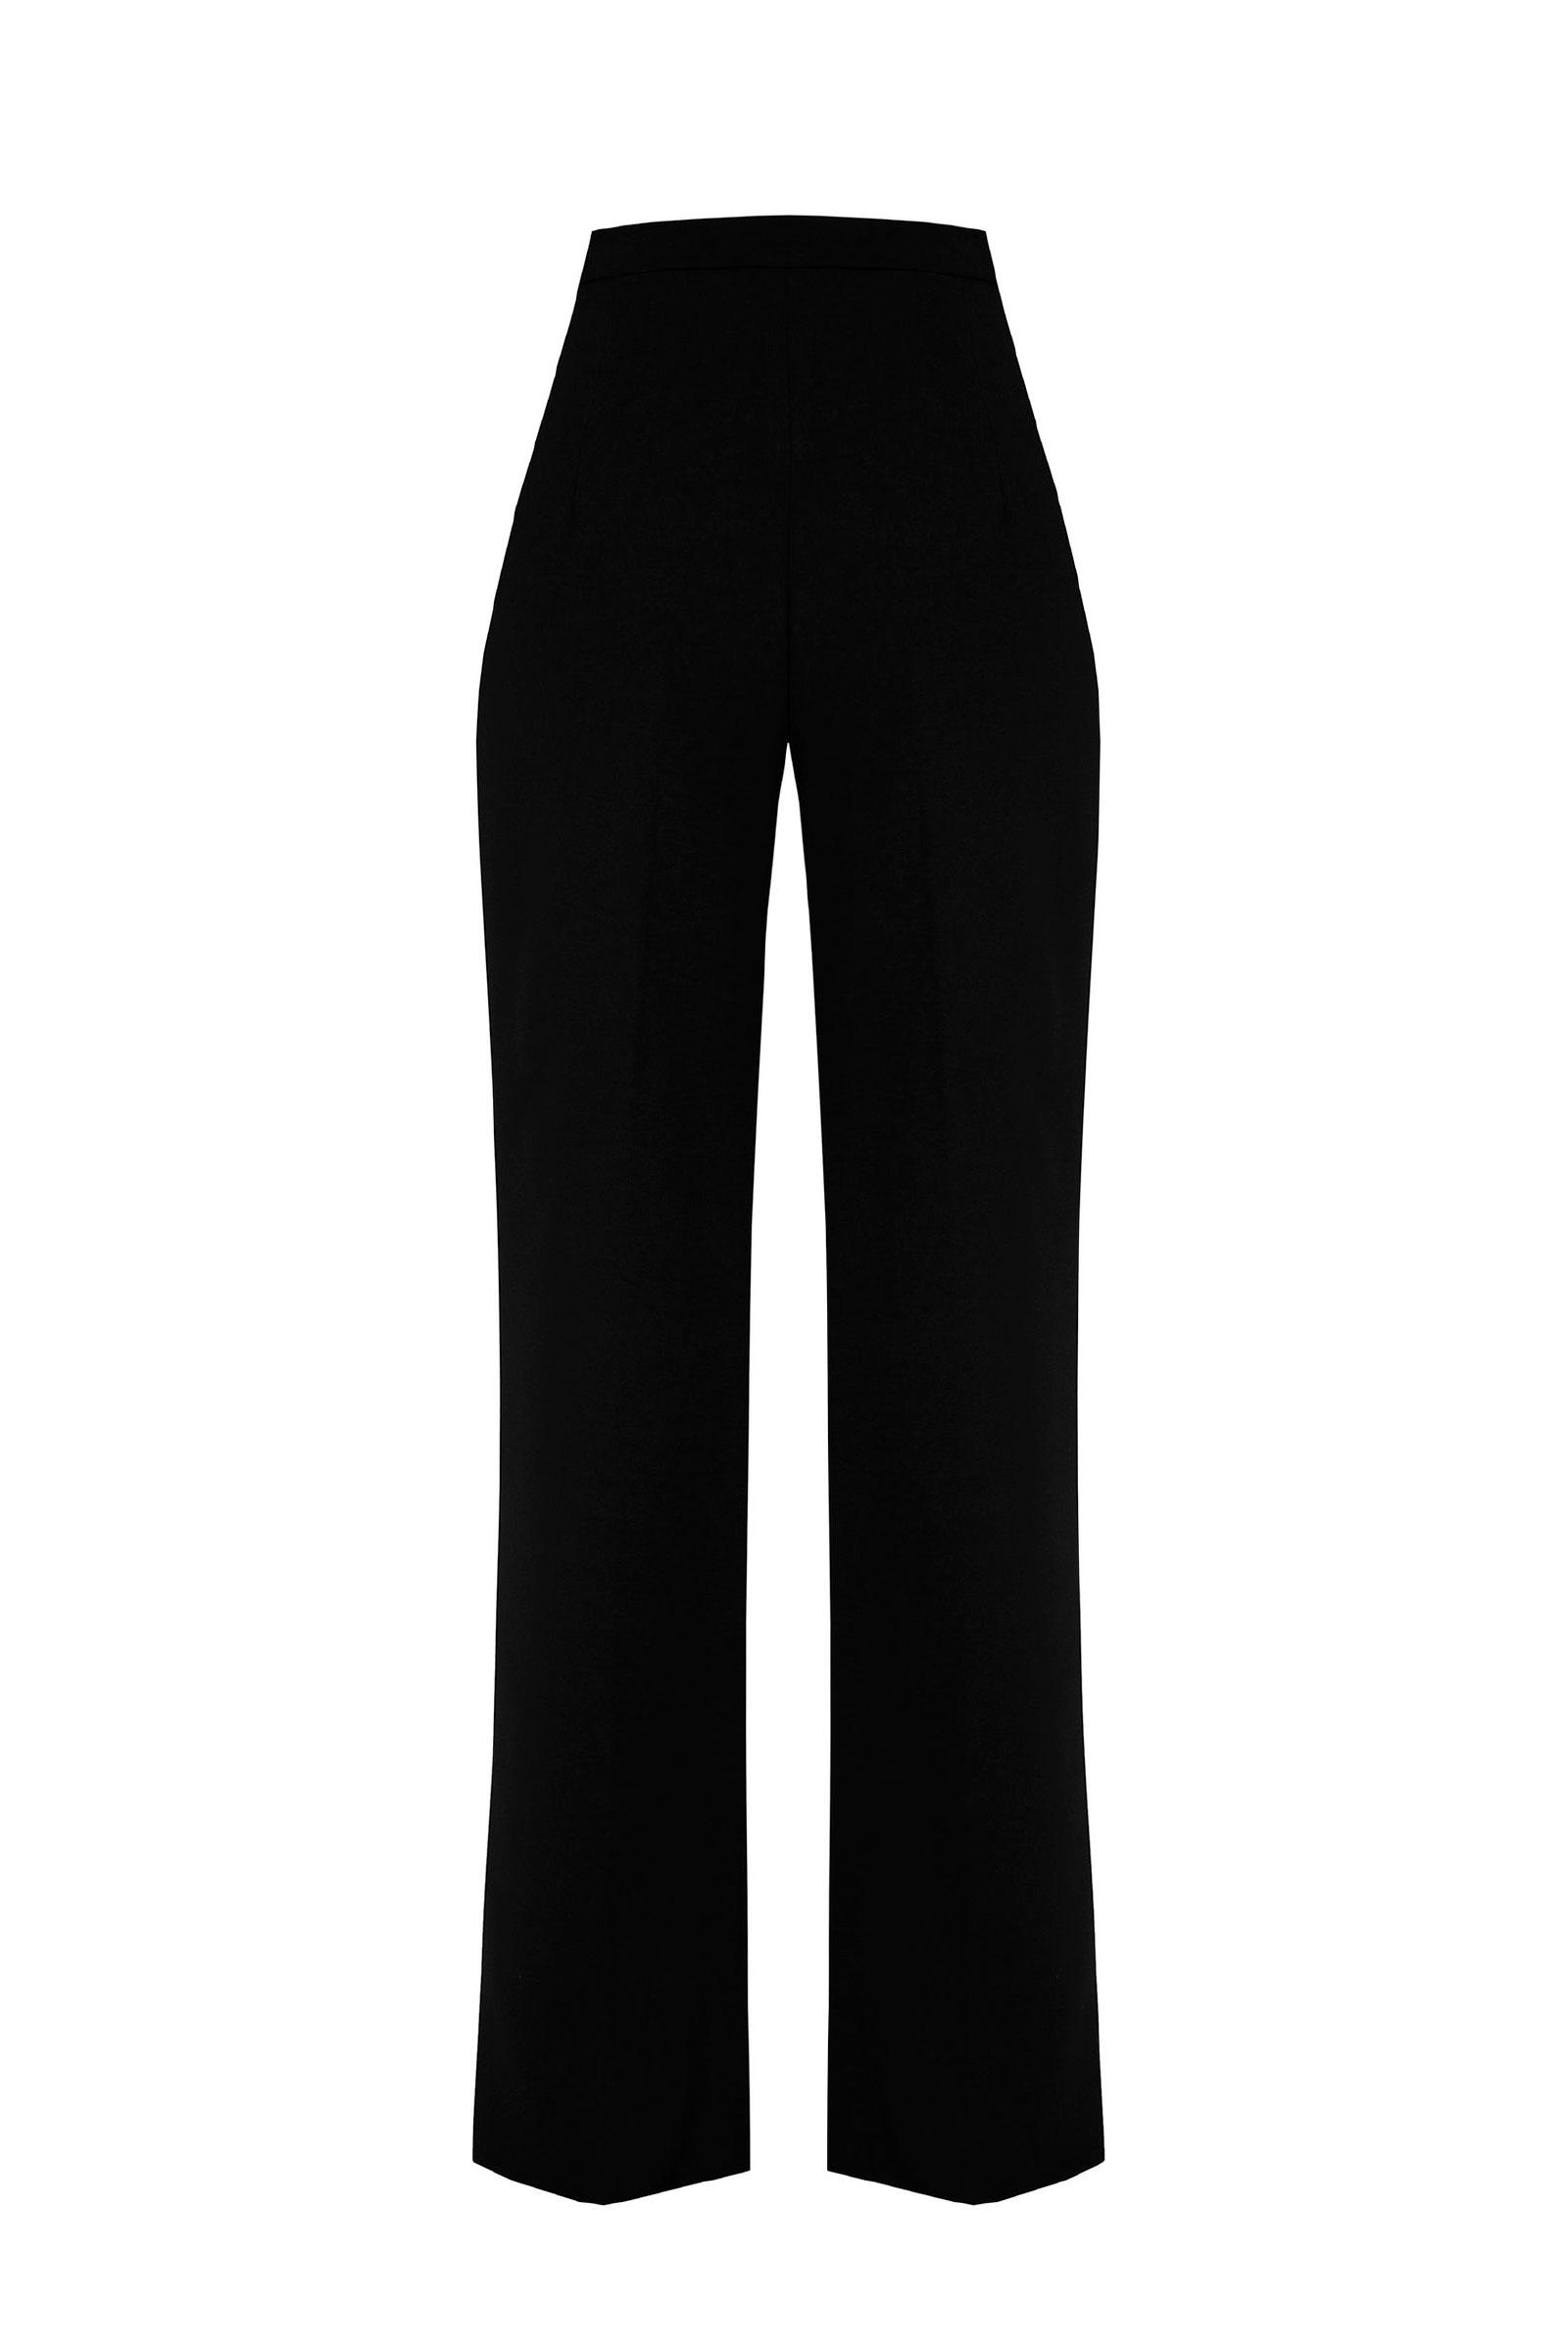 RINASCIMENTO Pantalone Donna RINASCIMENTO | Pantalone | CFC0017765002B001